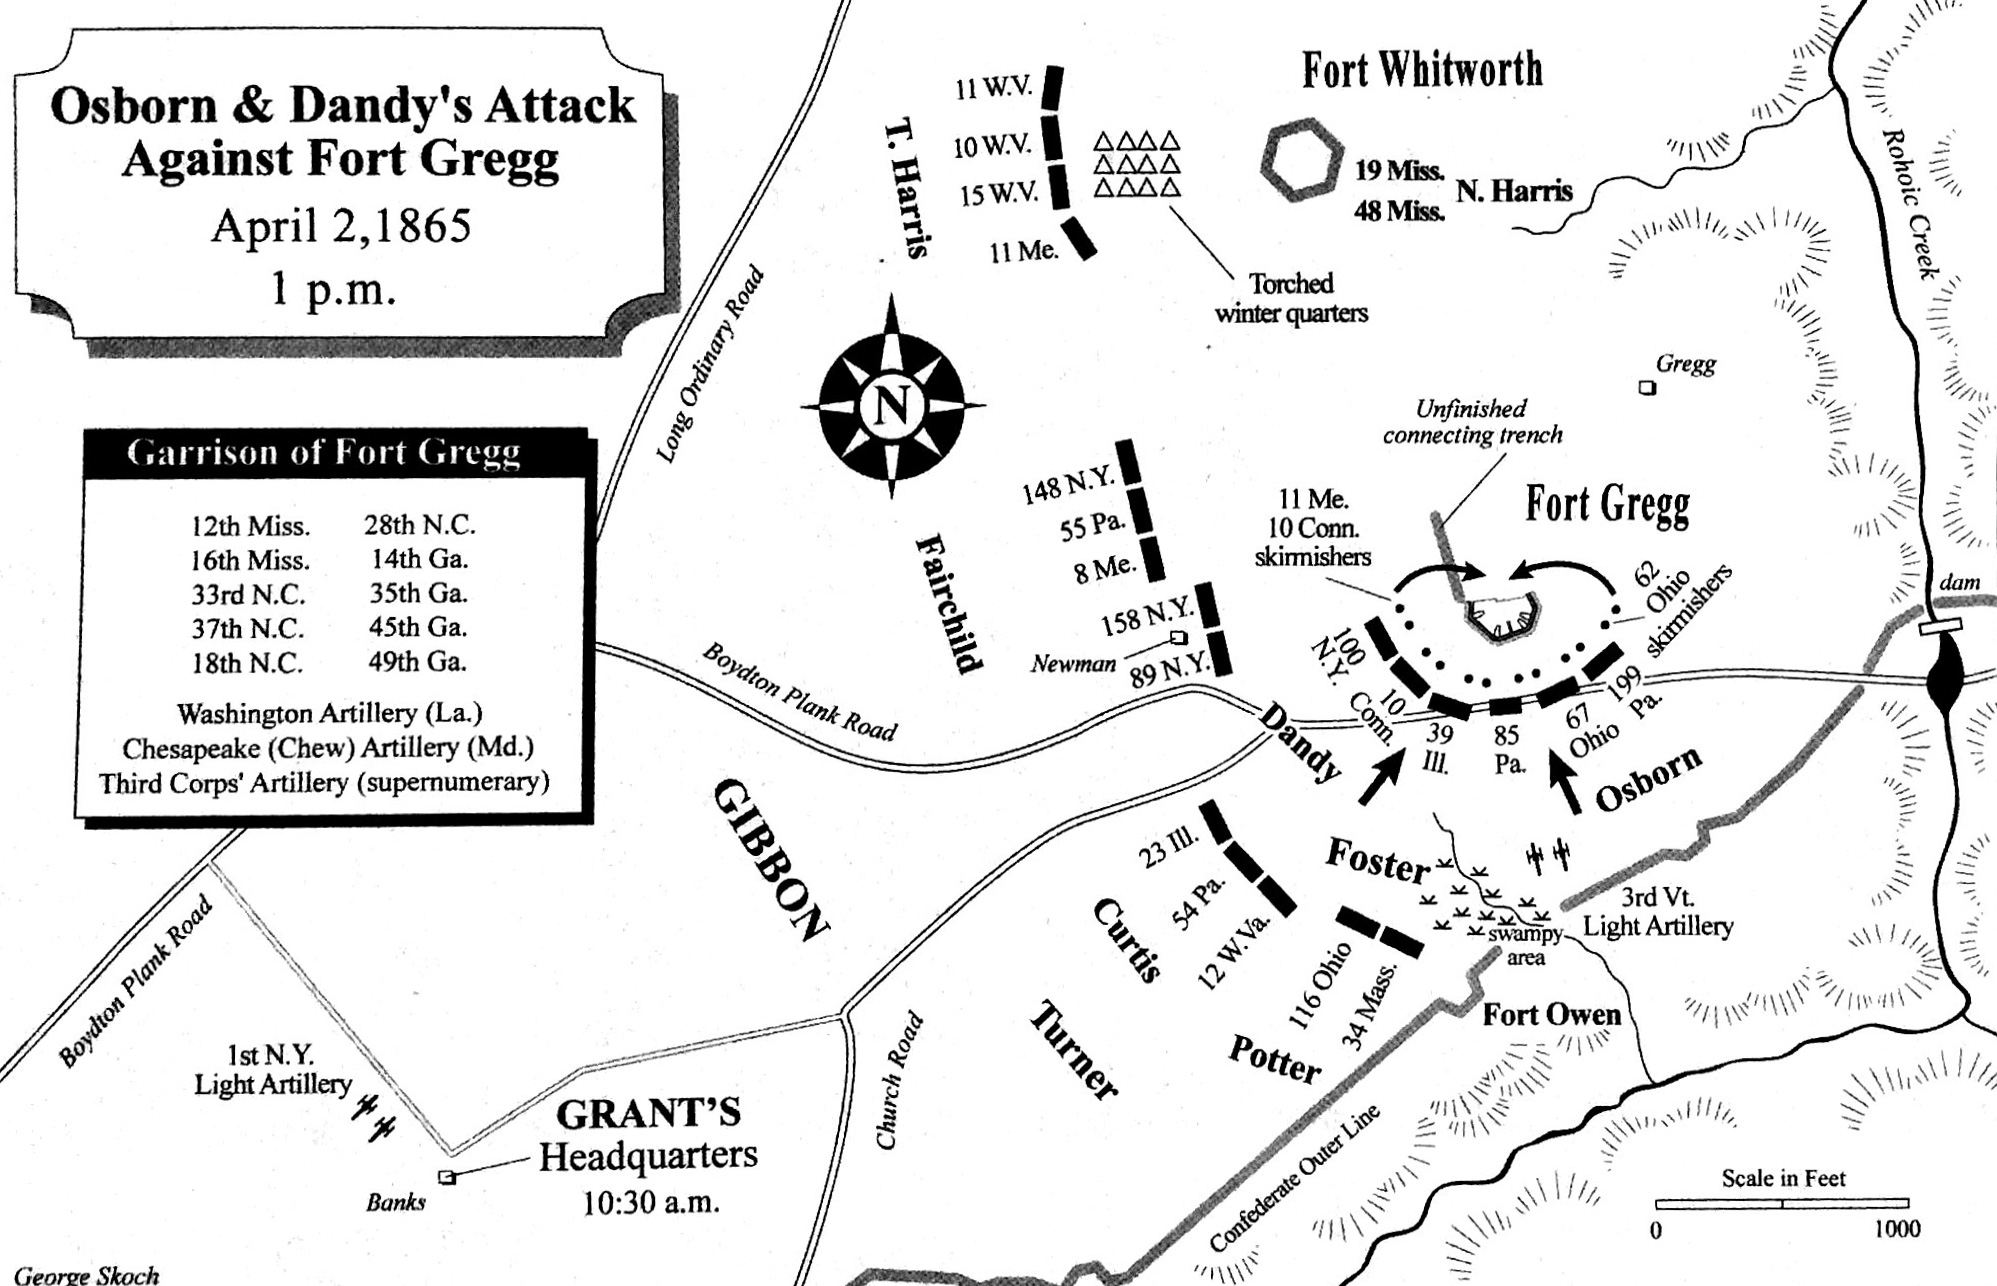 Battle Map of Fort Gregg Assault on 3 Apr 1865